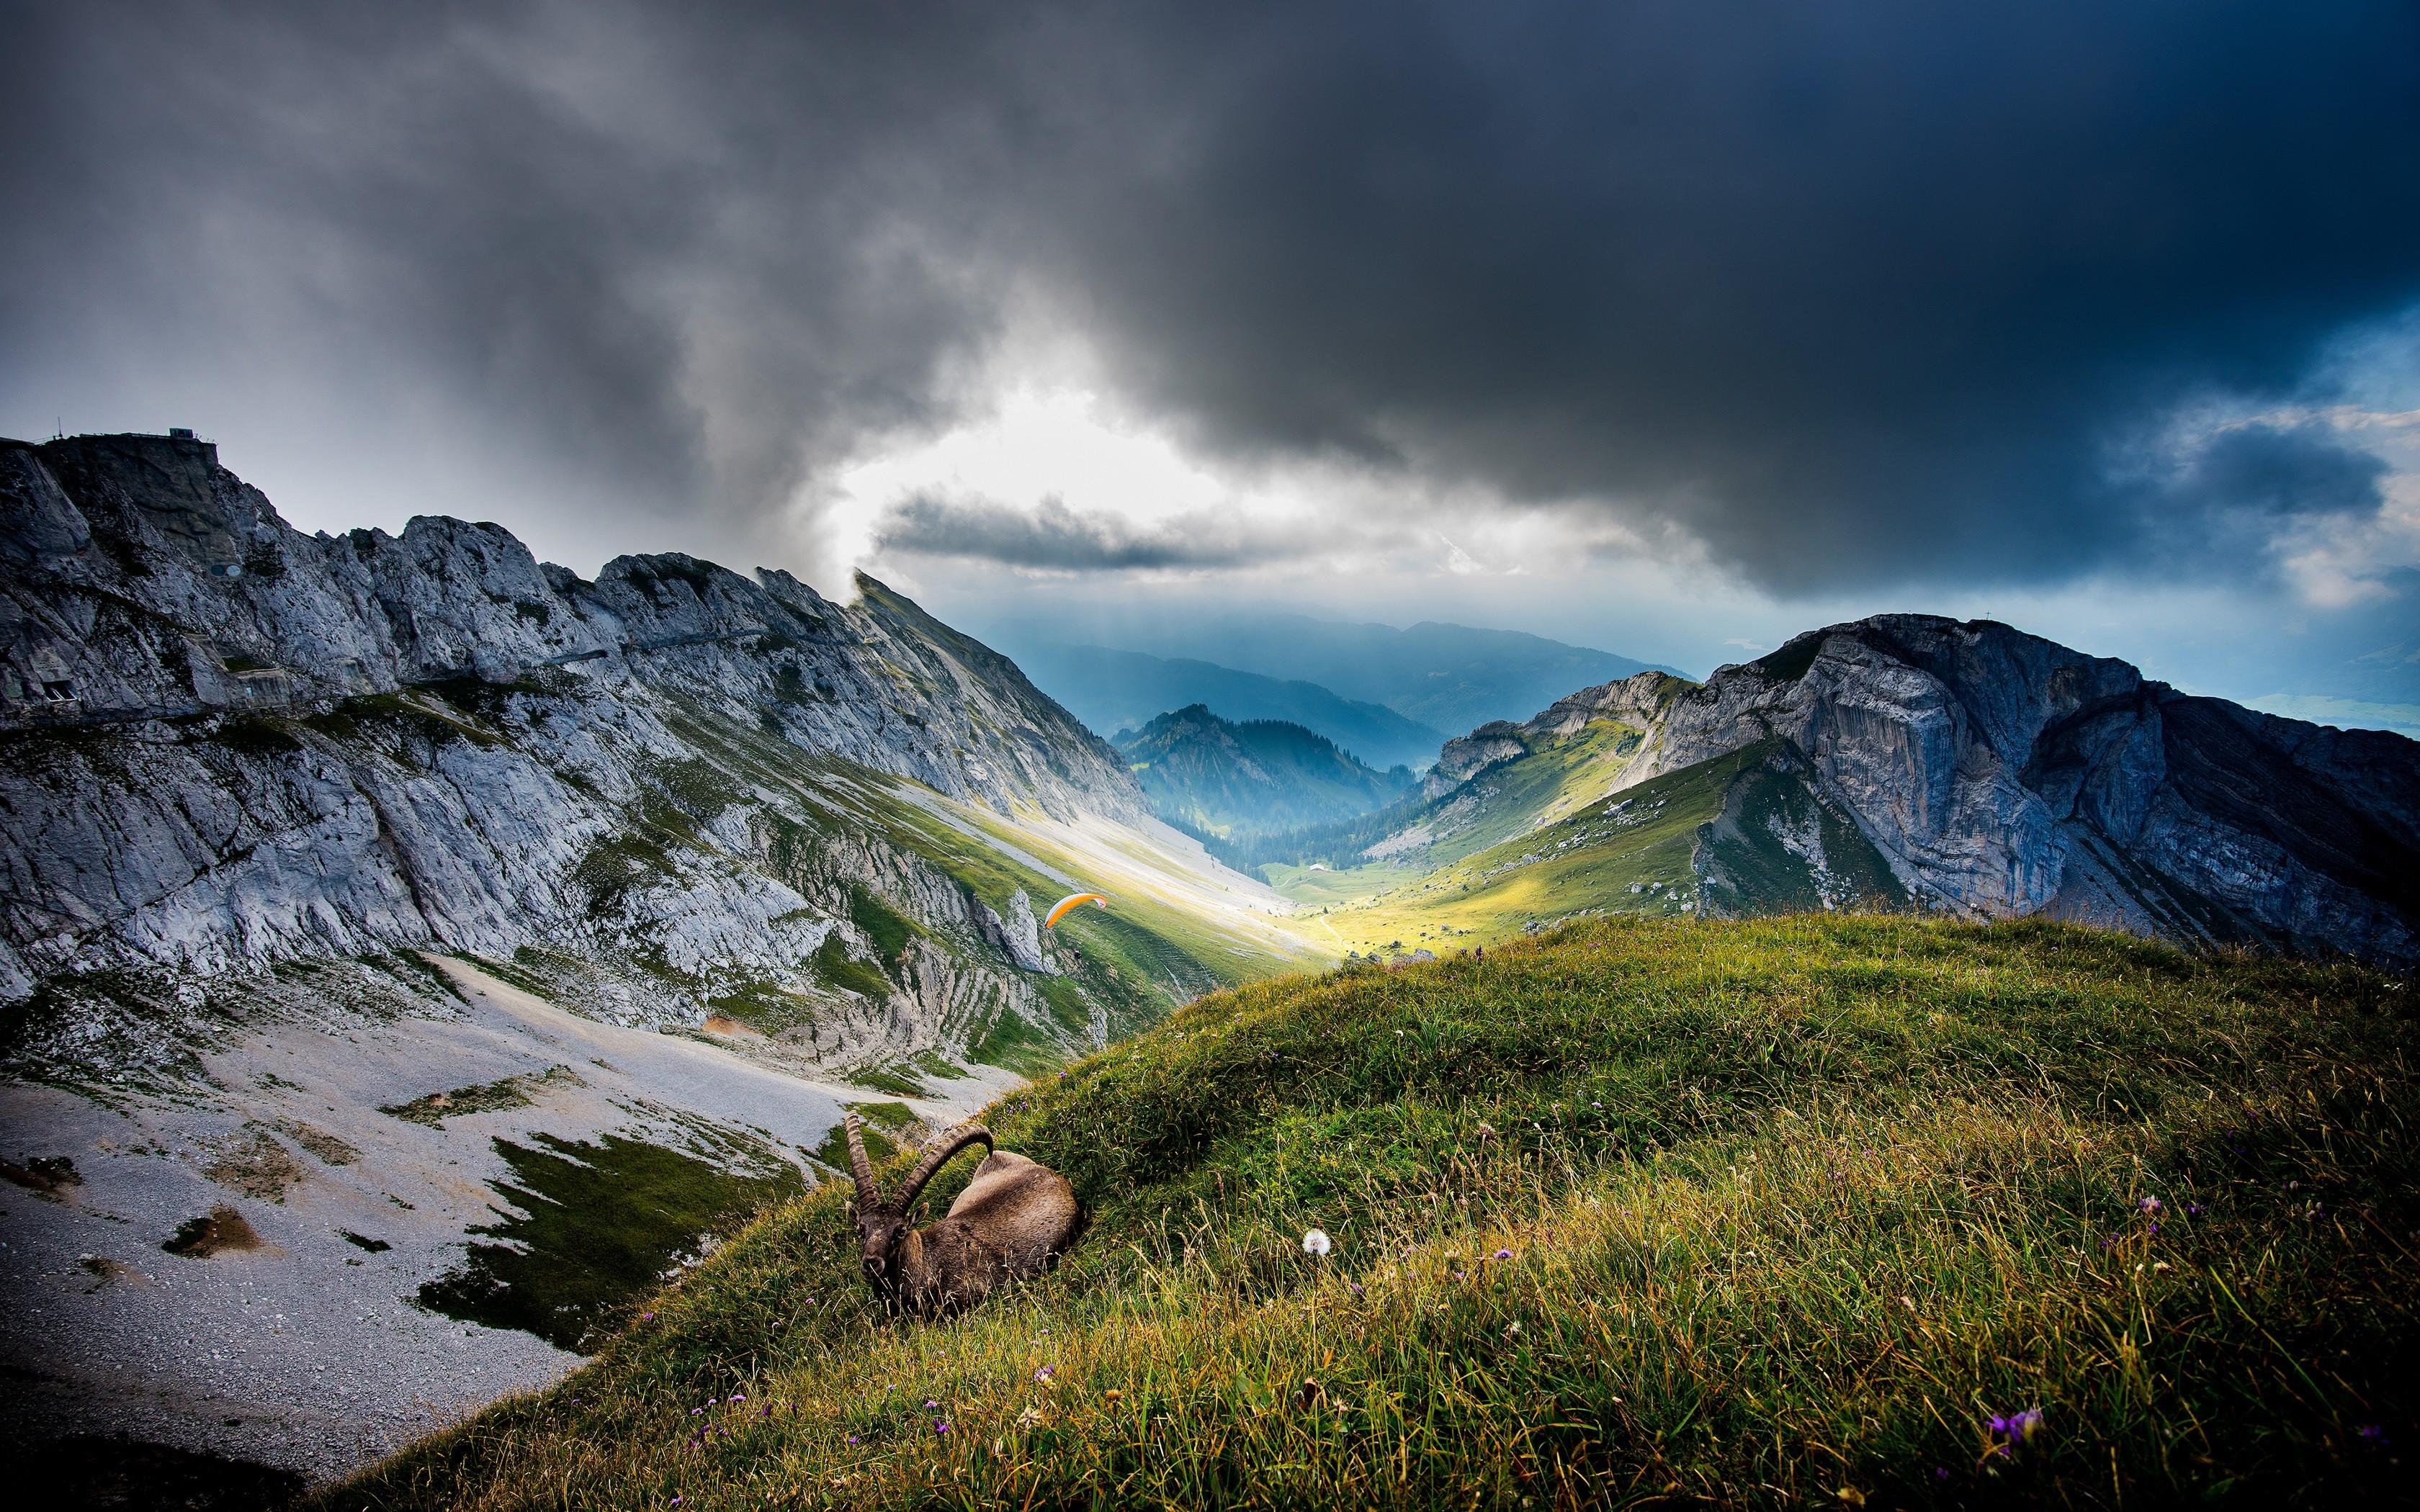 Paragliding Wallpaper Hd Mountain Clouds Ibex Nature Landscape Paragliding